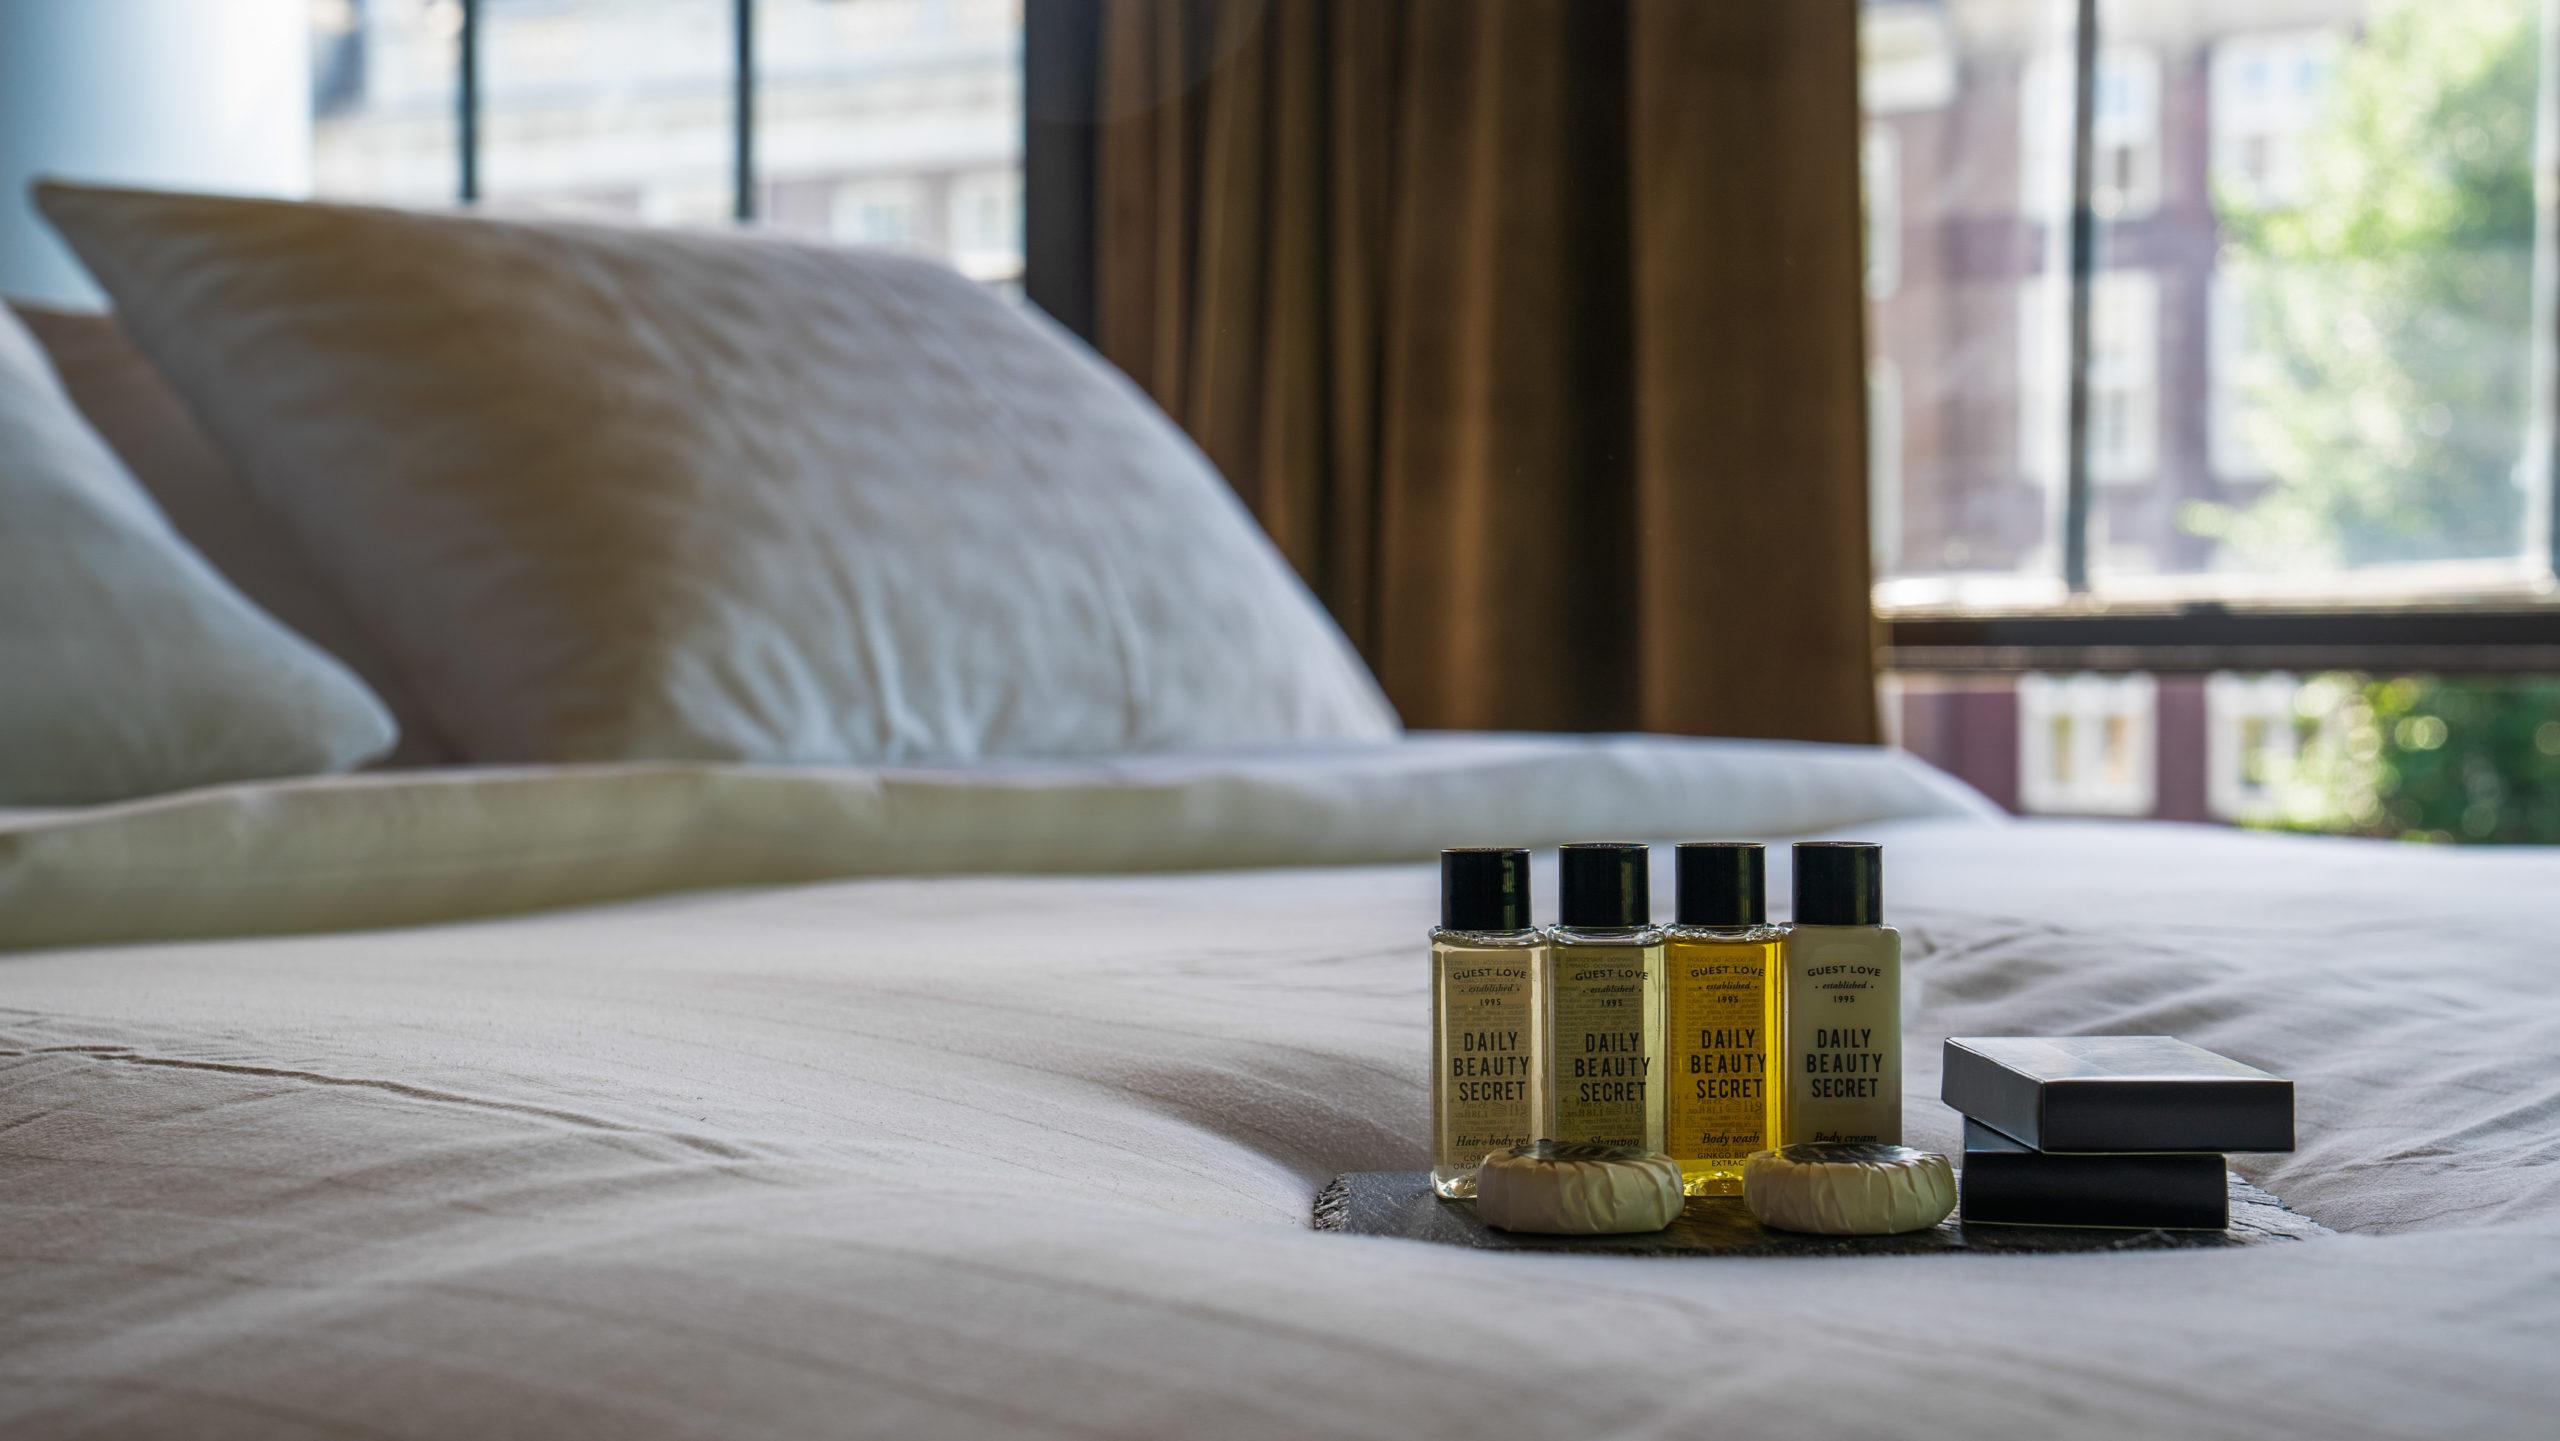 hotel_1666_thorbecke_jeroendenijs_bni_amsterdam_suite_detail